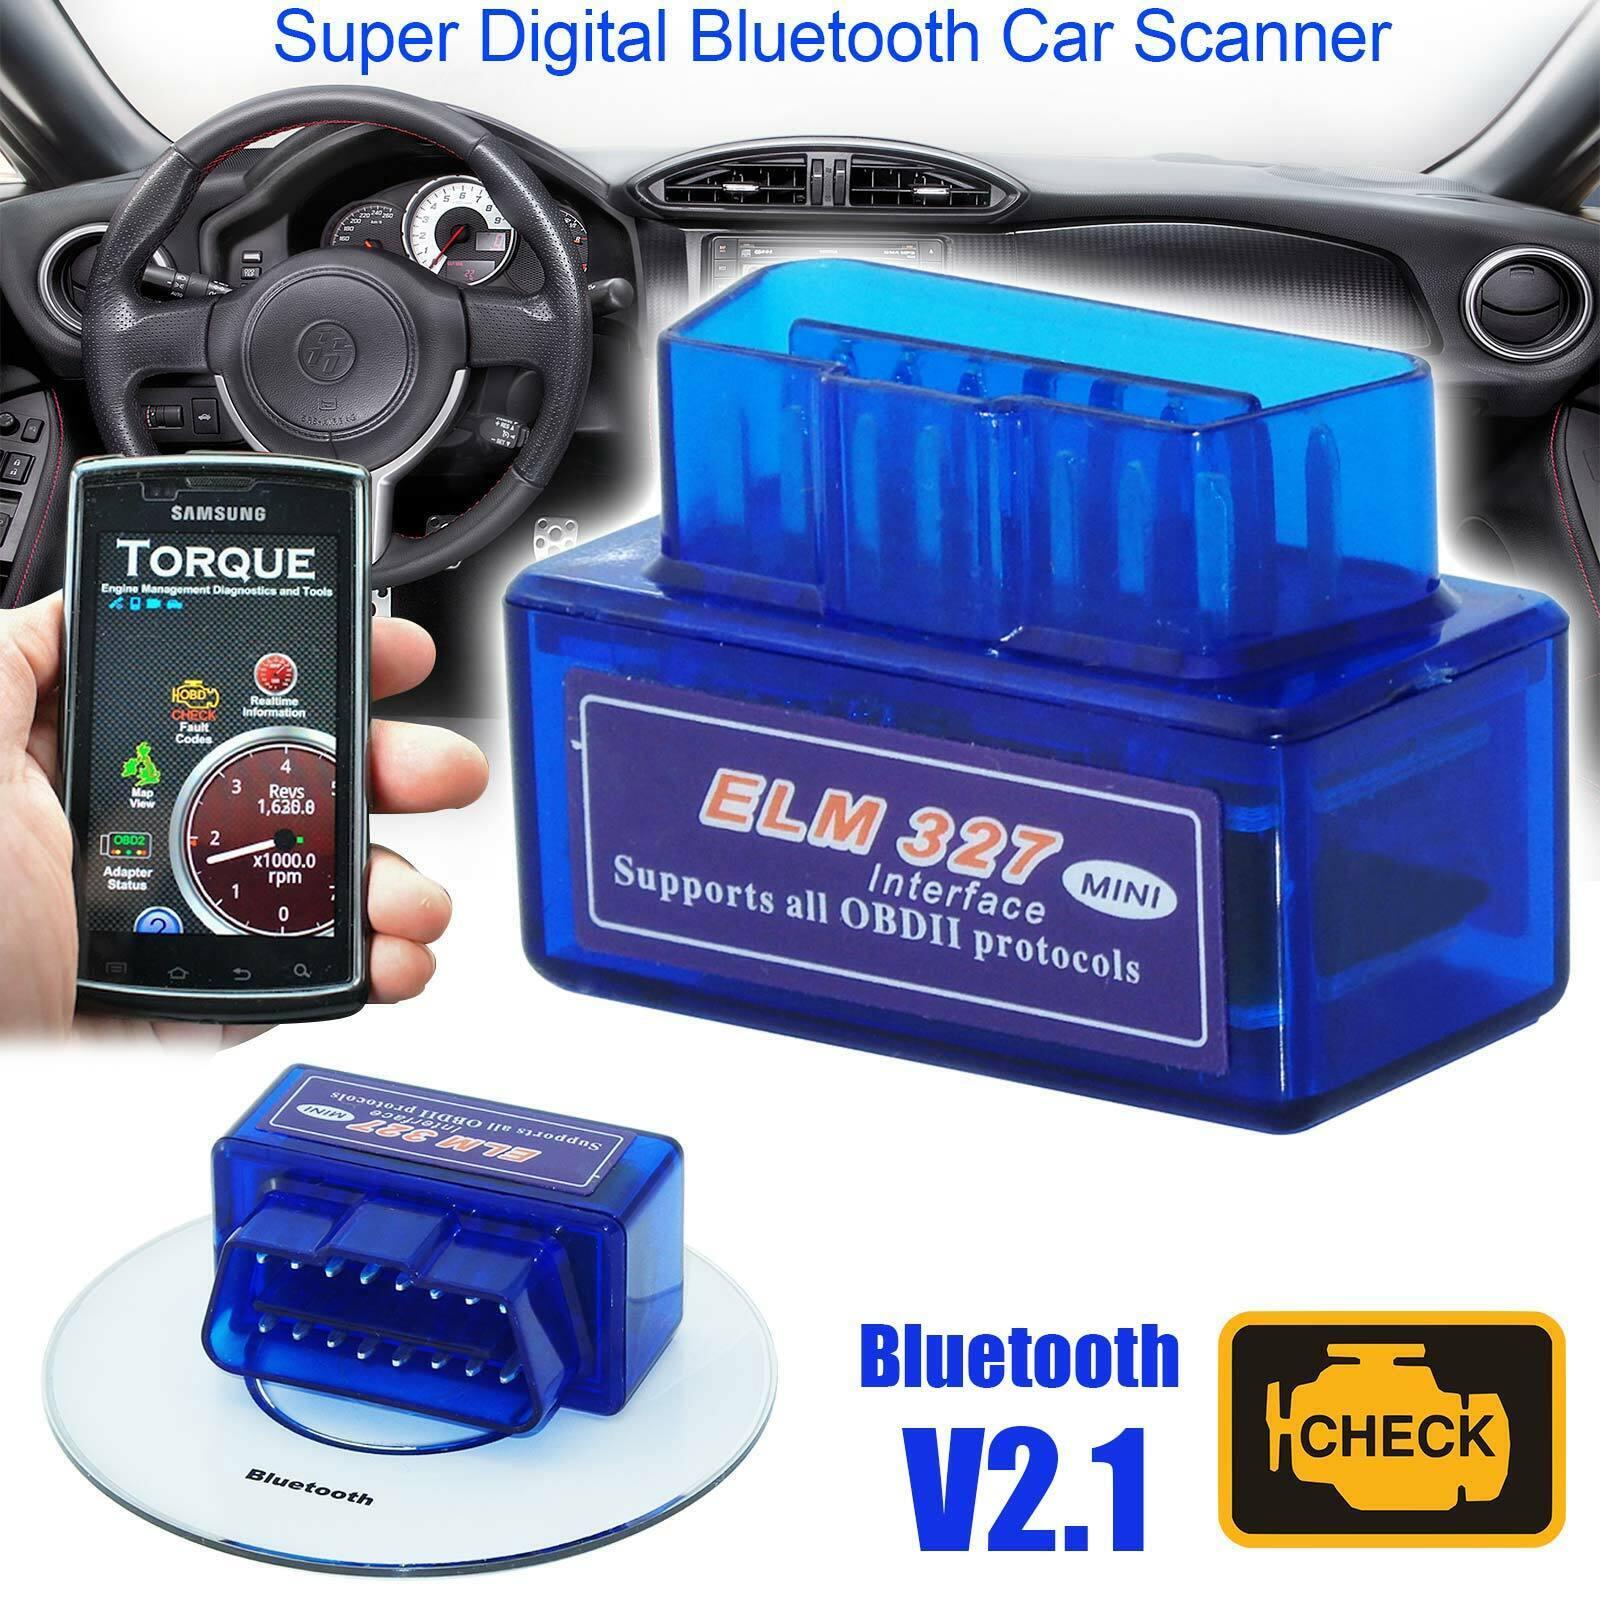 Mini ELM327 V2.1 Bluetooth OBD2 Scanner Code Reader Auto Diagnostic Tool